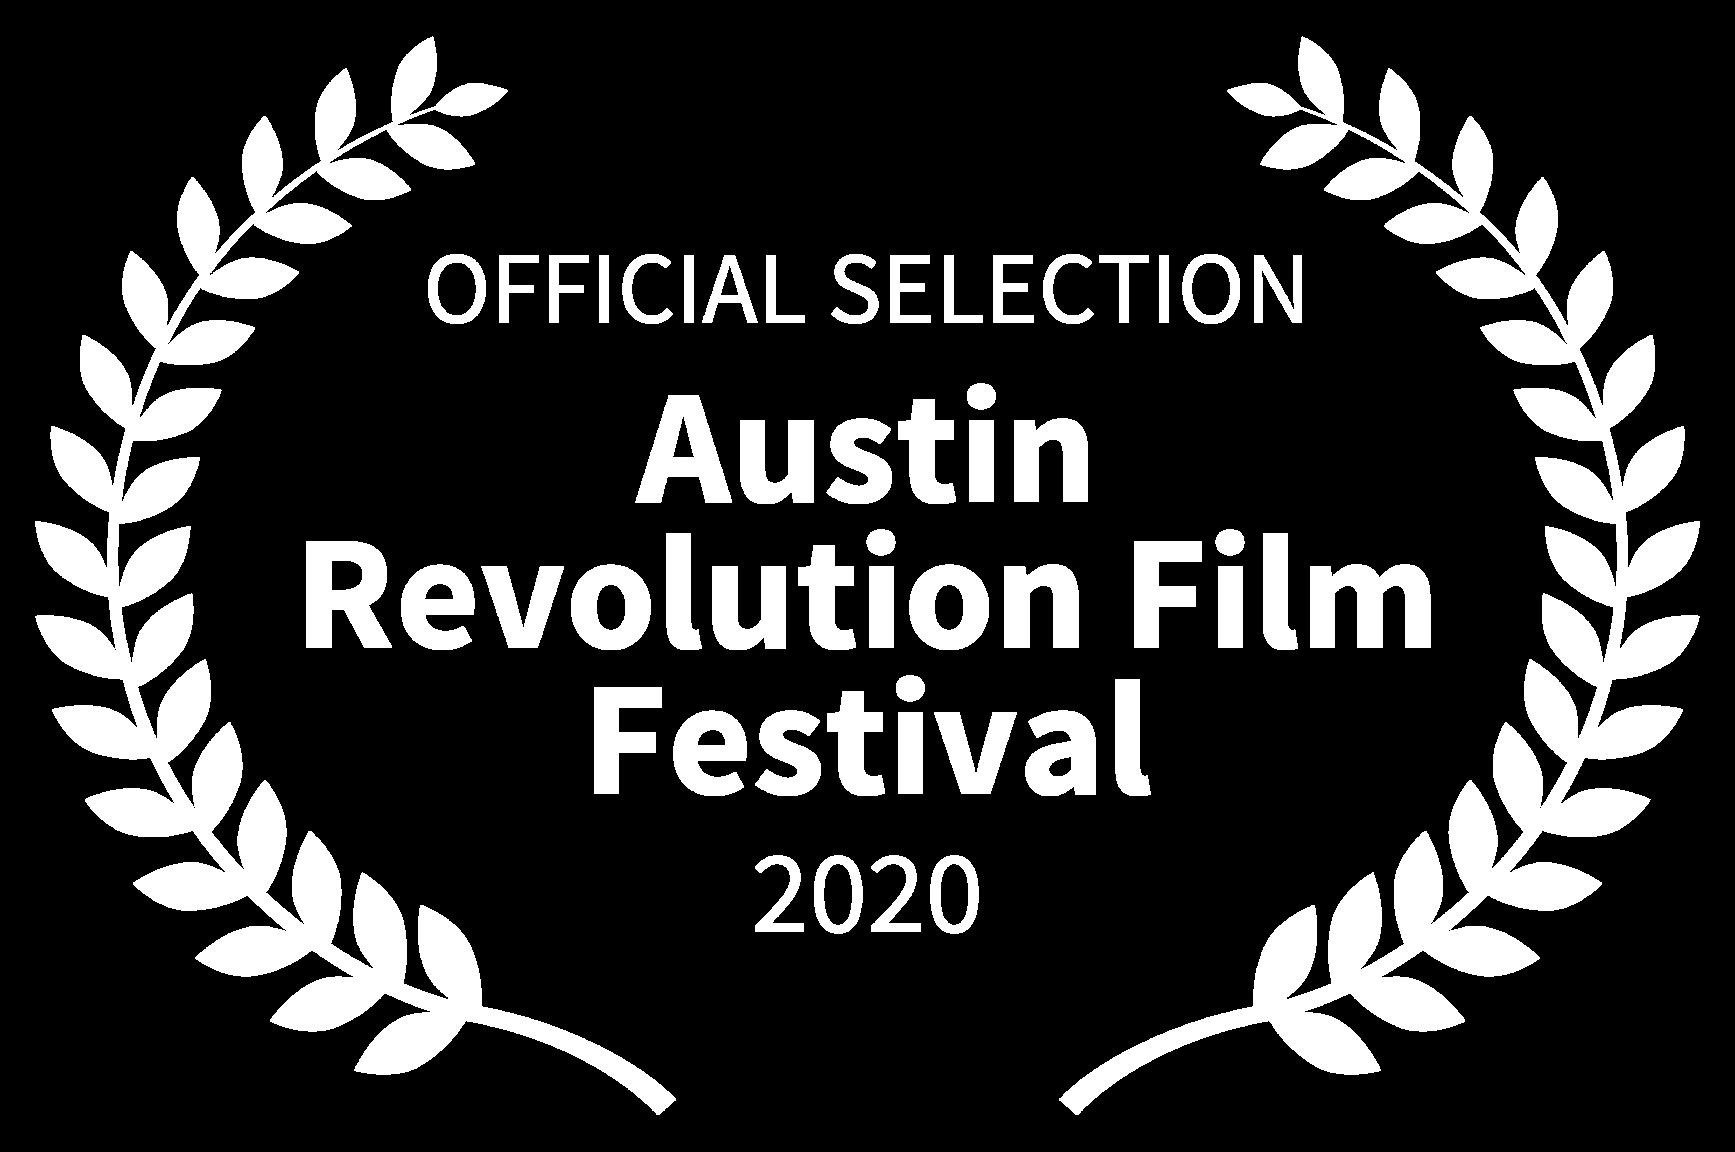 OFFICIAL SELECTION - Austin Revolution Film Festival - 2020